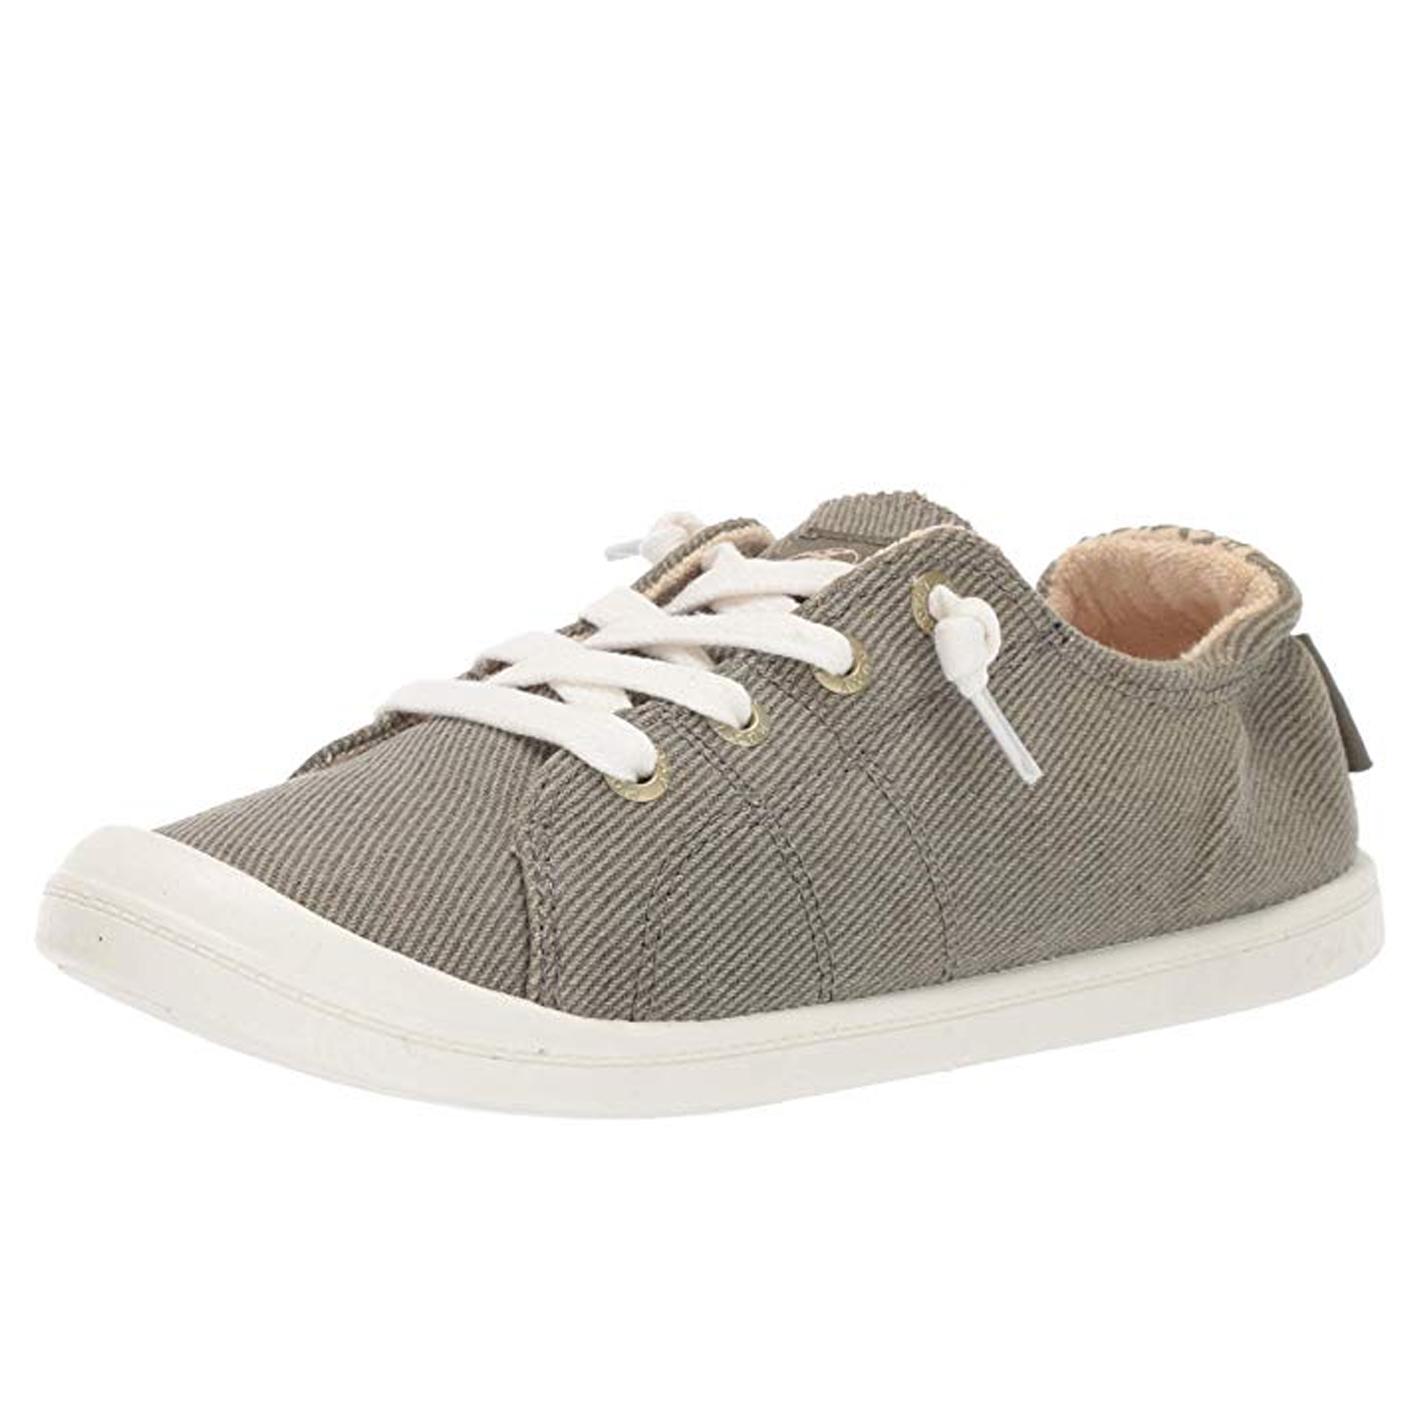 Roxy Bayshore Shoes for Women